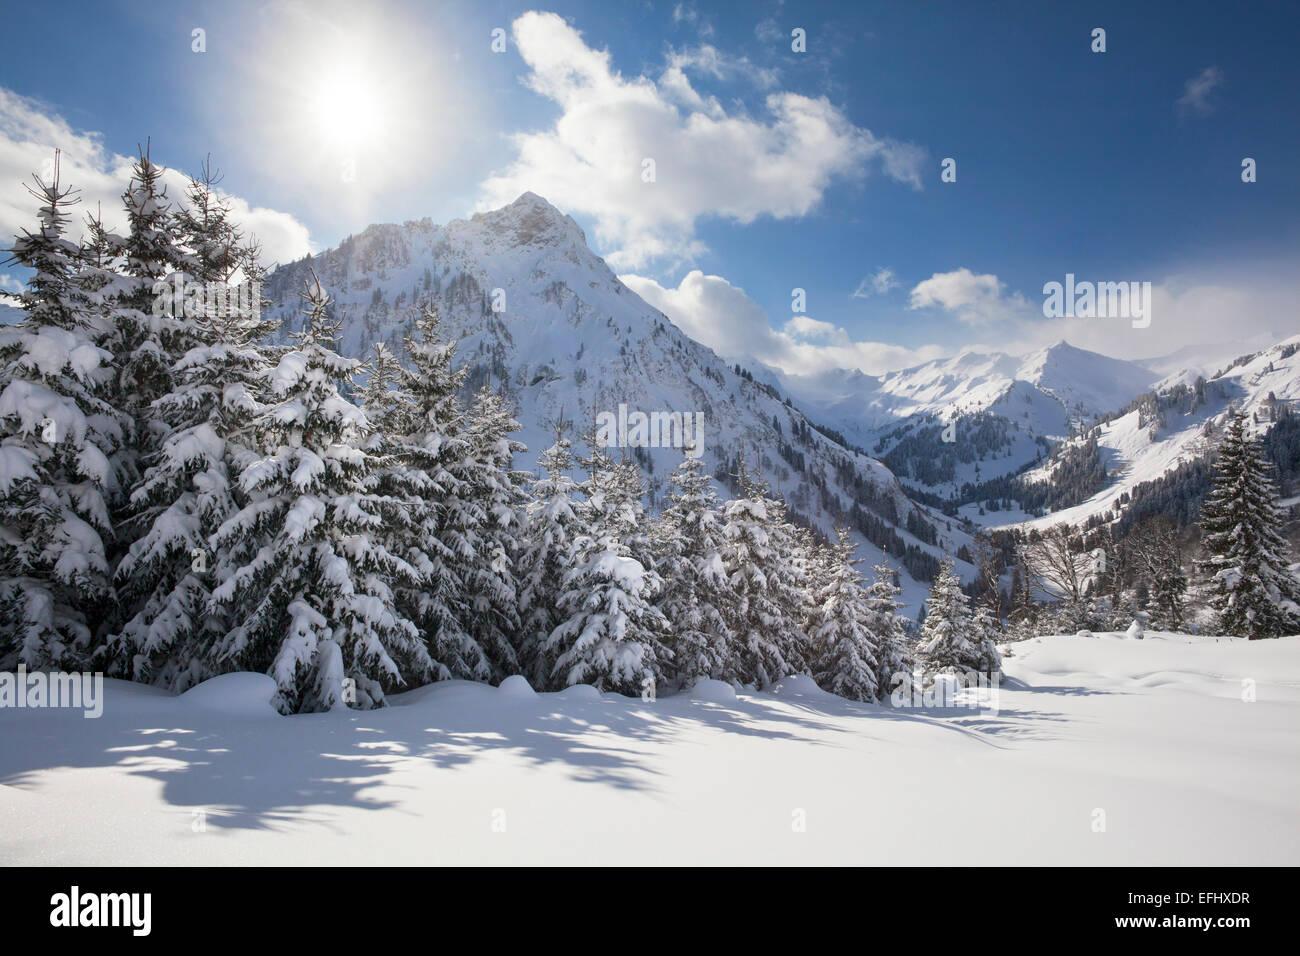 Winter landscape at Hintersteiner Tal, near Bad Hindelang, view to Giebel, Allgaeu, Bavaria, Germany - Stock Image